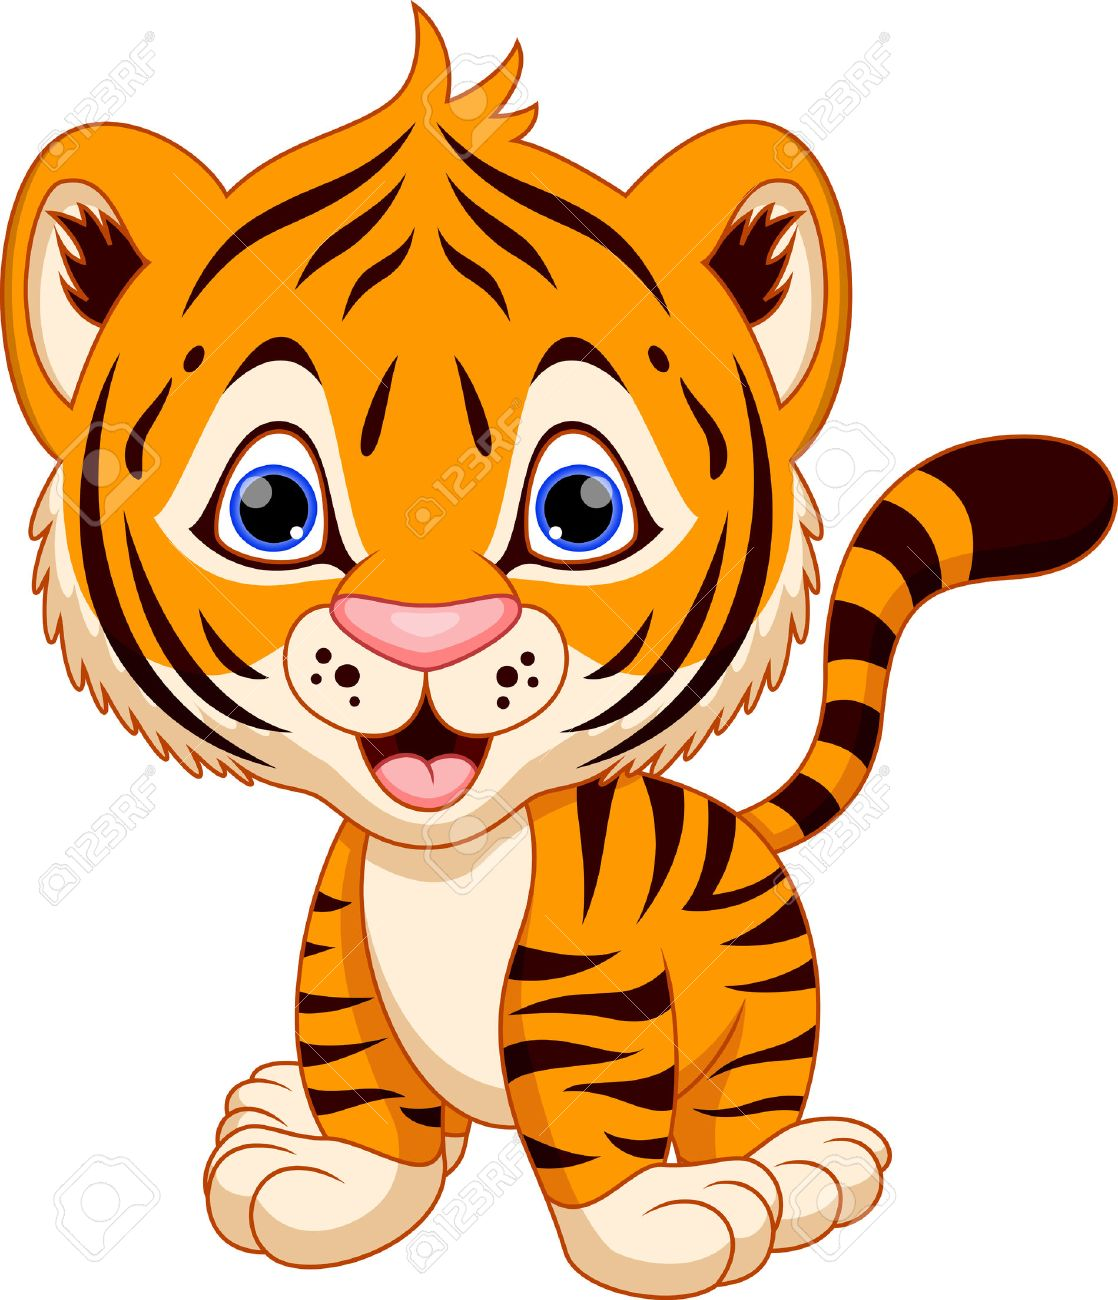 cute baby tiger cartoon royalty free cliparts vectors and stock rh 123rf com